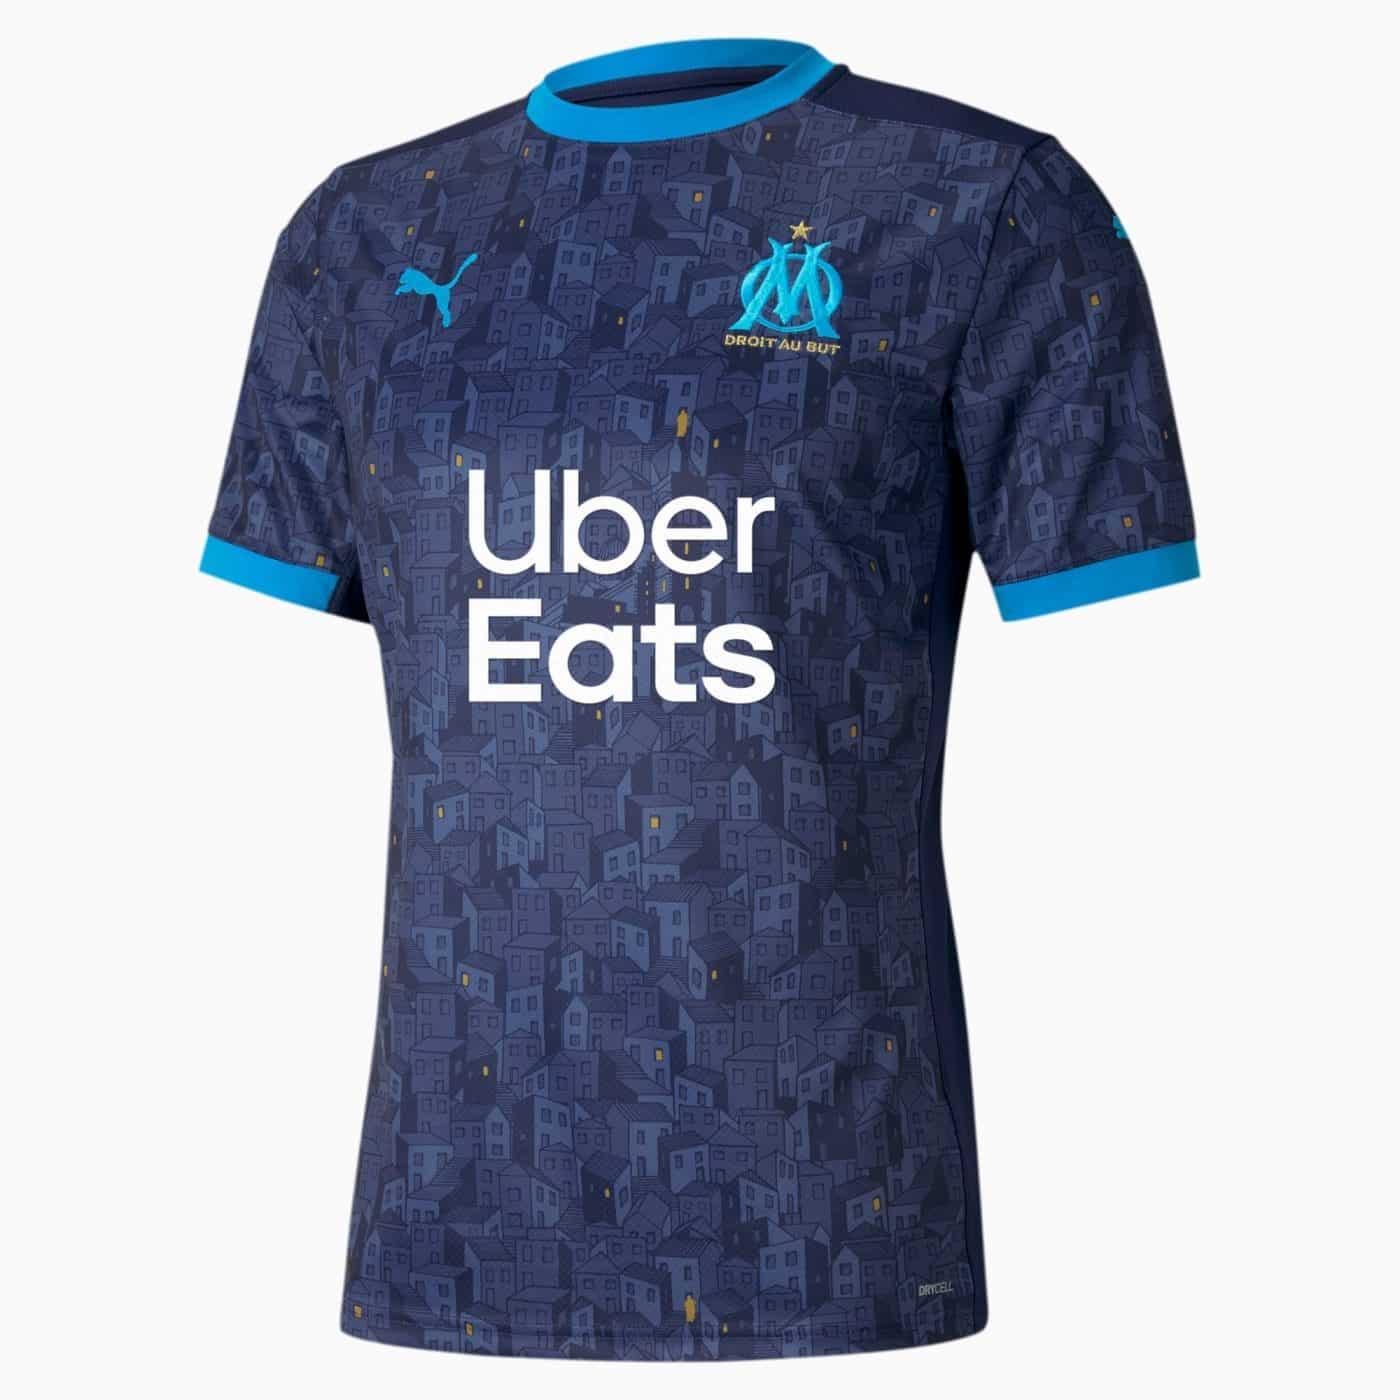 Maillot-exterieur-Olympique-de-Marseille-2020-2021-puma